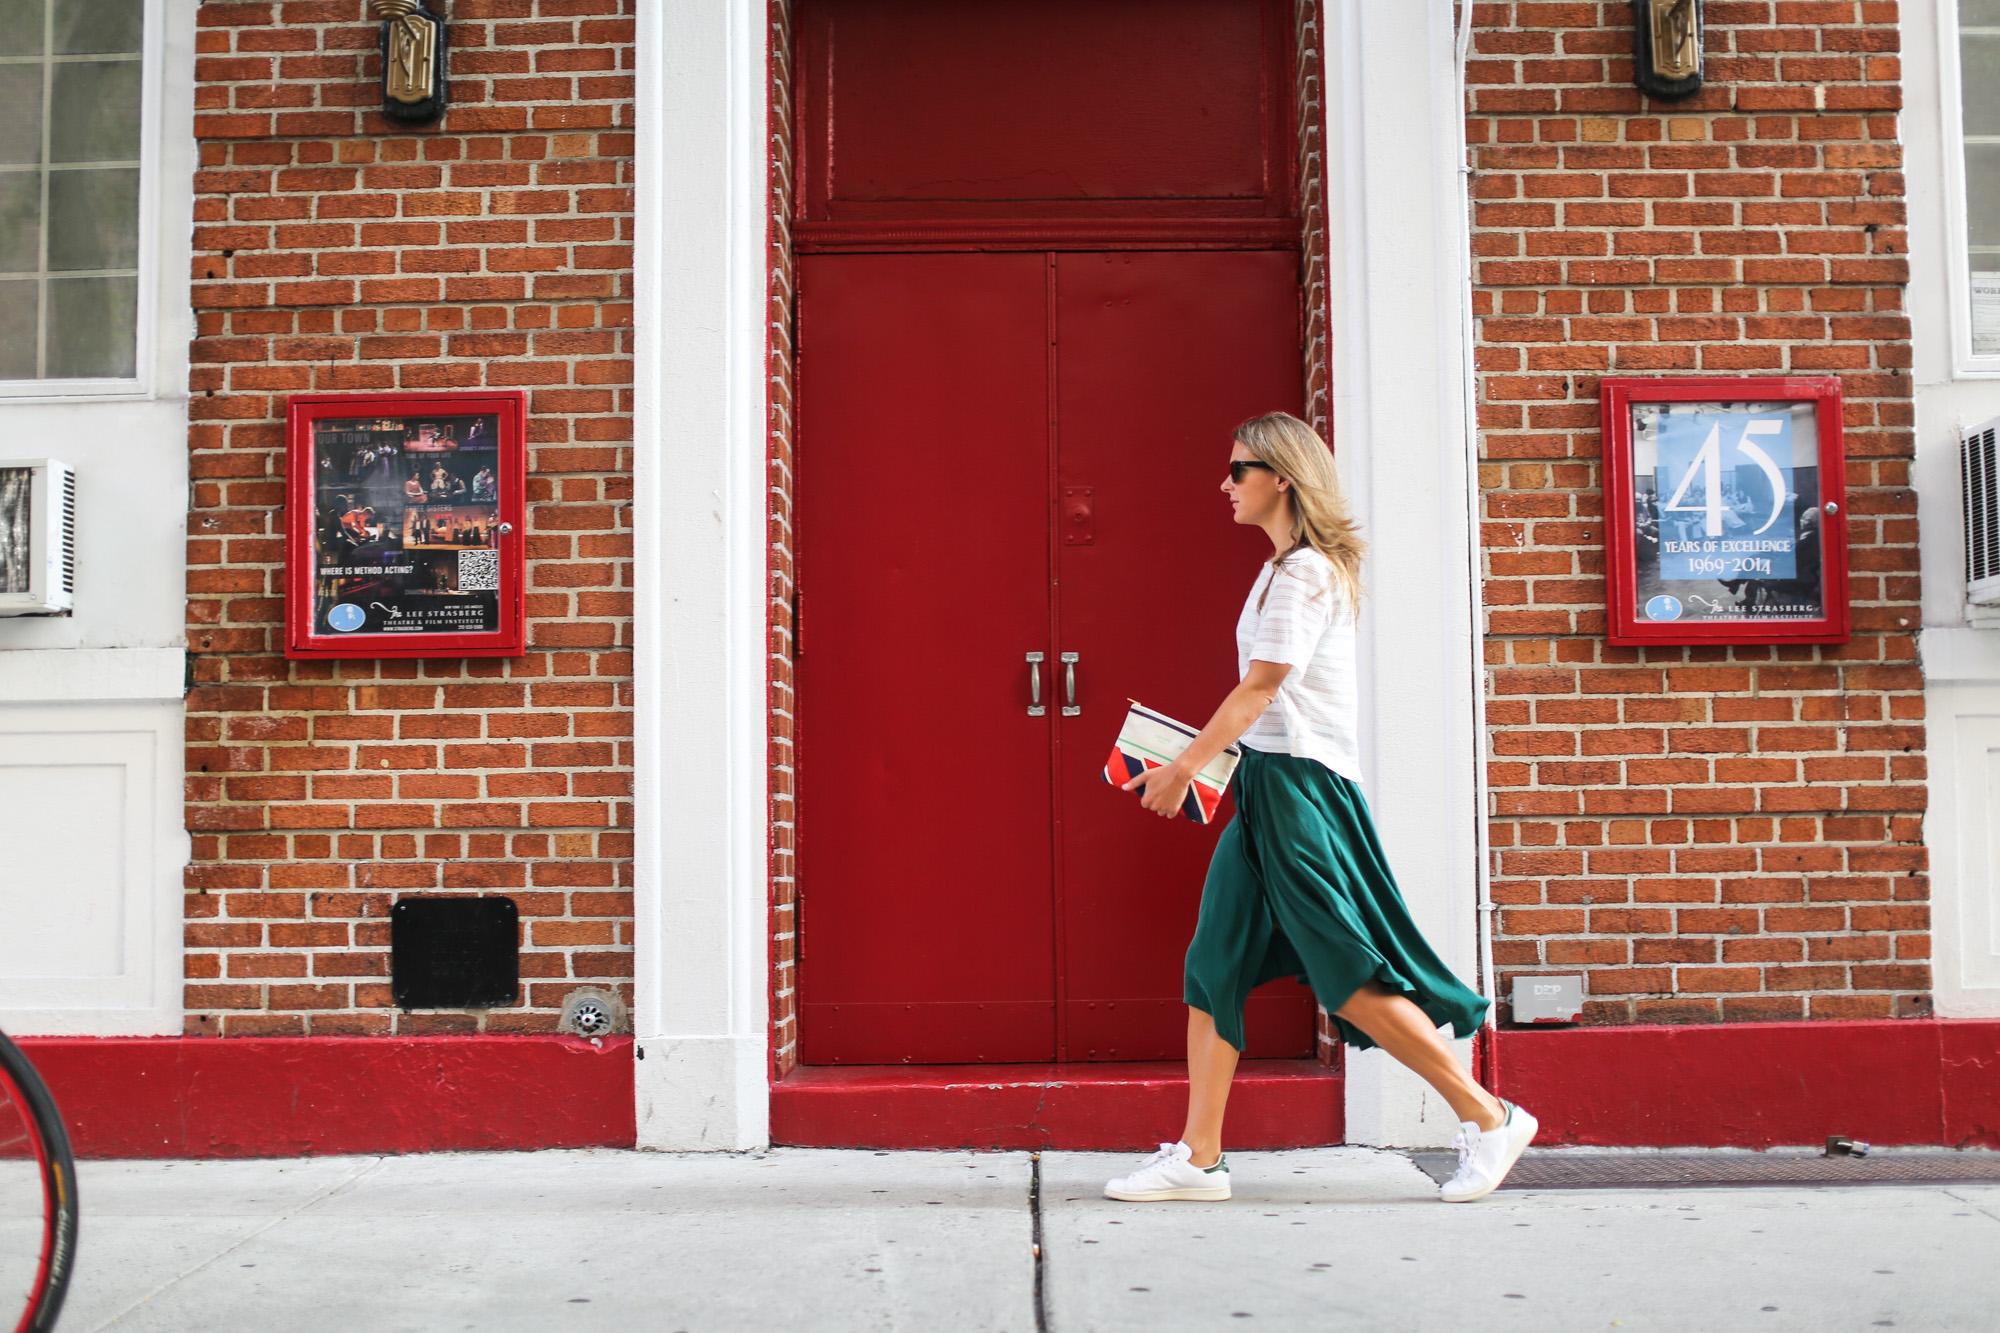 Clochet_streetstyle_newyork_h&m_trend_green_midi_skirt_adidas_stansmith